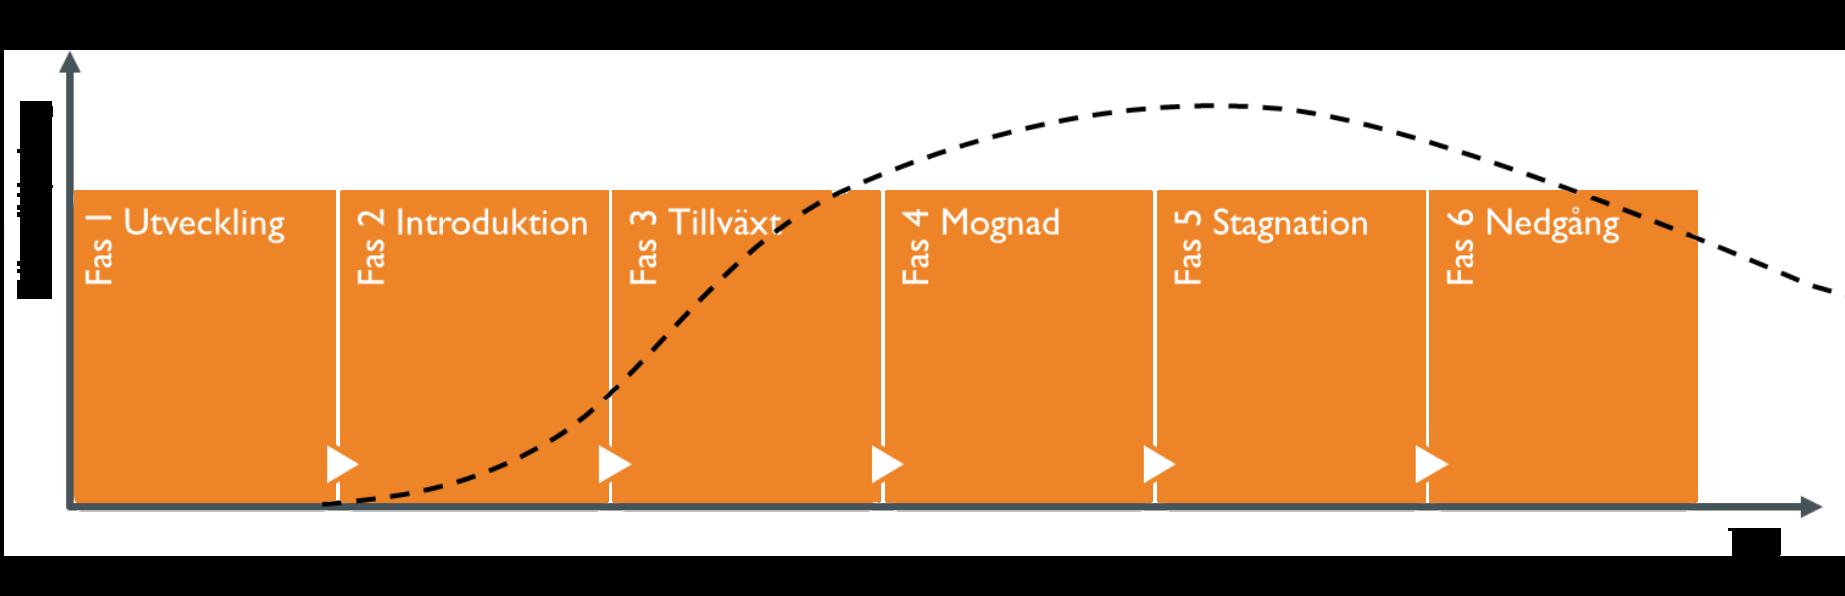 market_insight_product